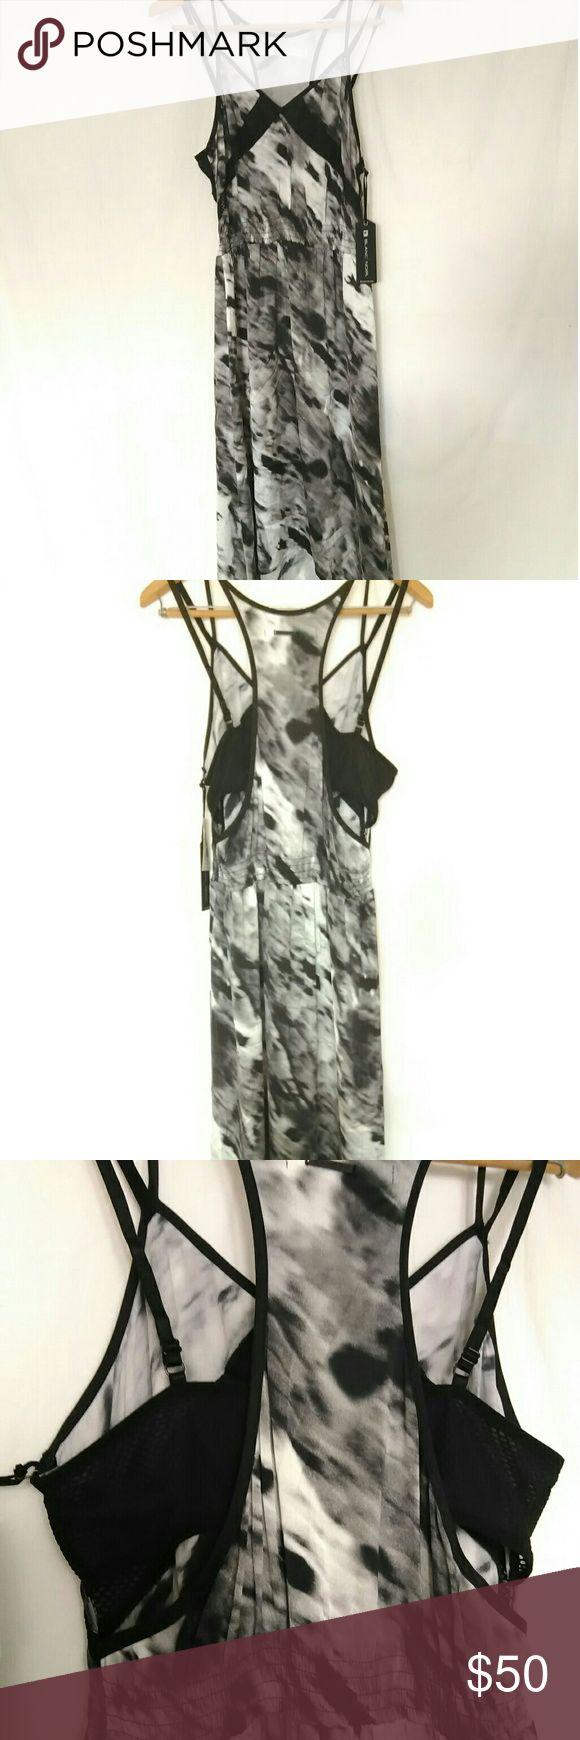 Black Noir Print Silk Slip High Low Design Dress Silk/Spandex Blend, Smocked waist,  Exposed sewn in bra open back, Length 46 inches Black Noir Dresses High Low